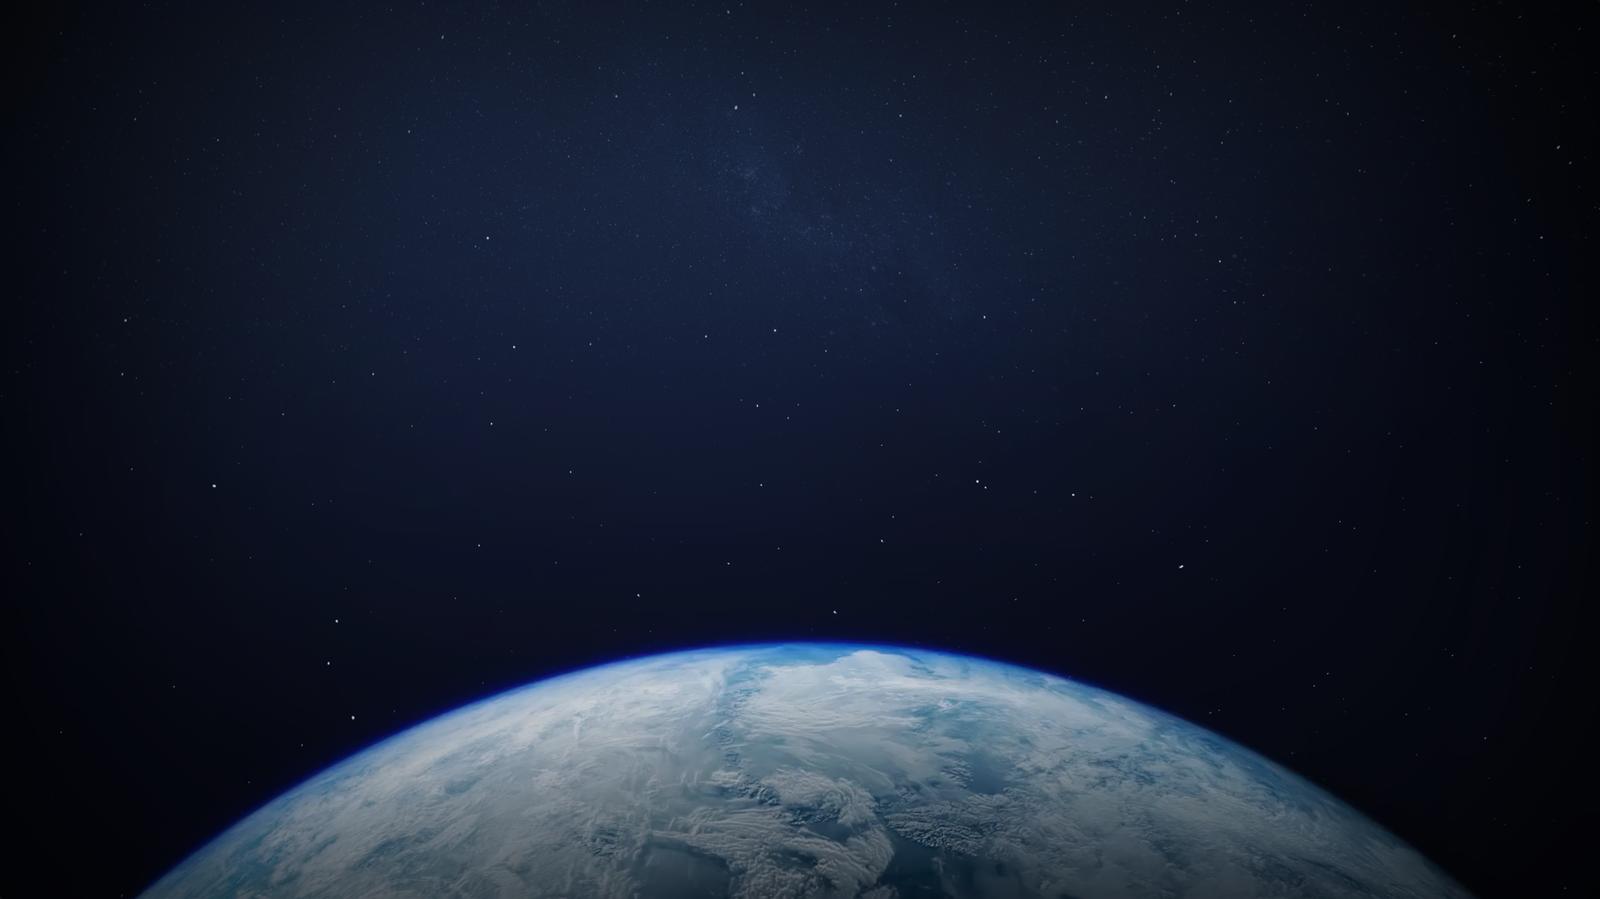 planet background image